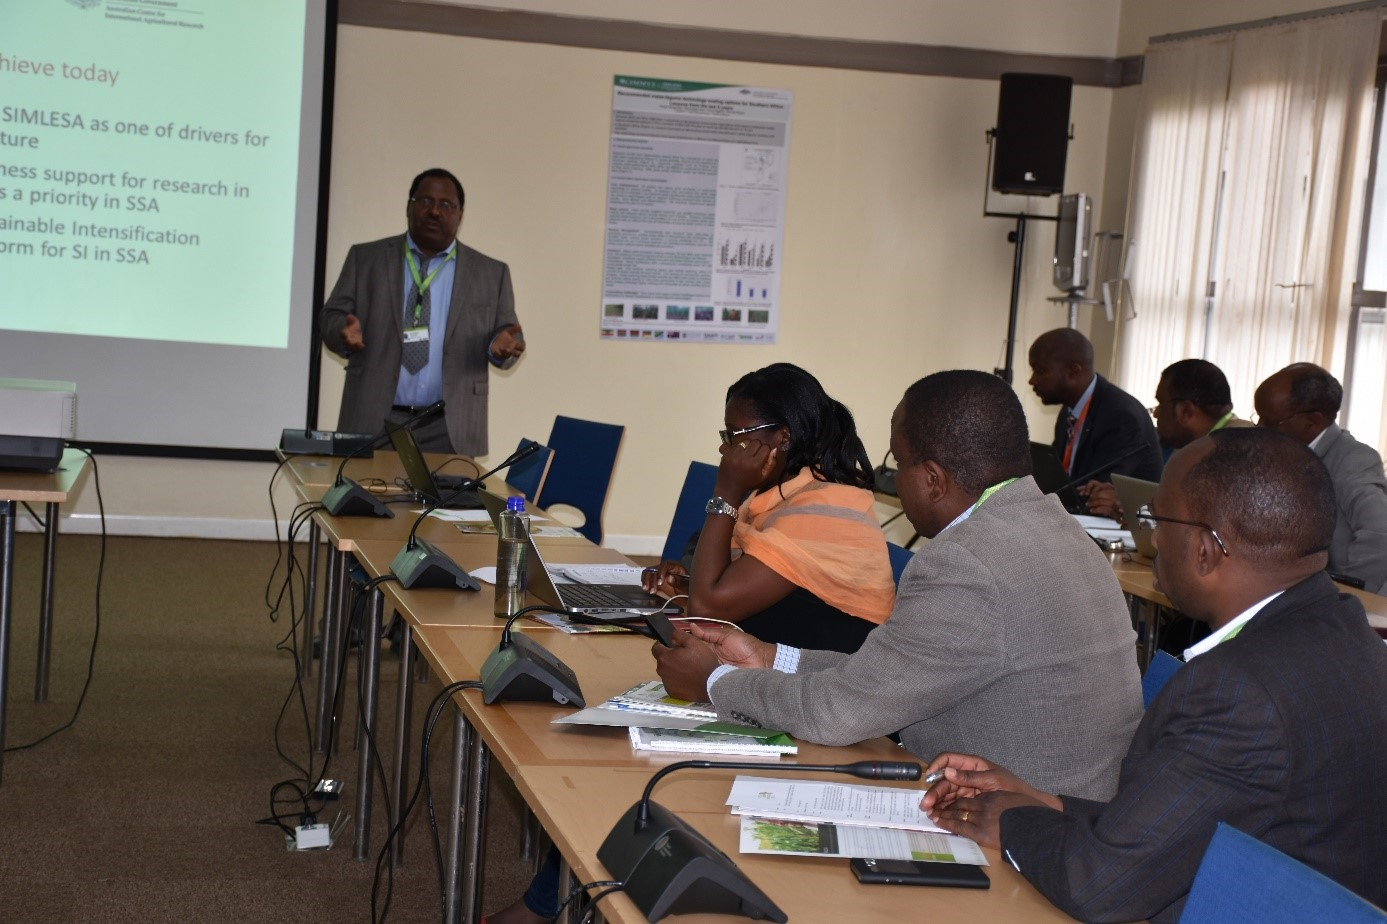 Mulugetta Mekuria, project leader of SIMLESA, makes a presentation focusing on SIMLESA's work. Photo: B. Wawa/CIMMYT